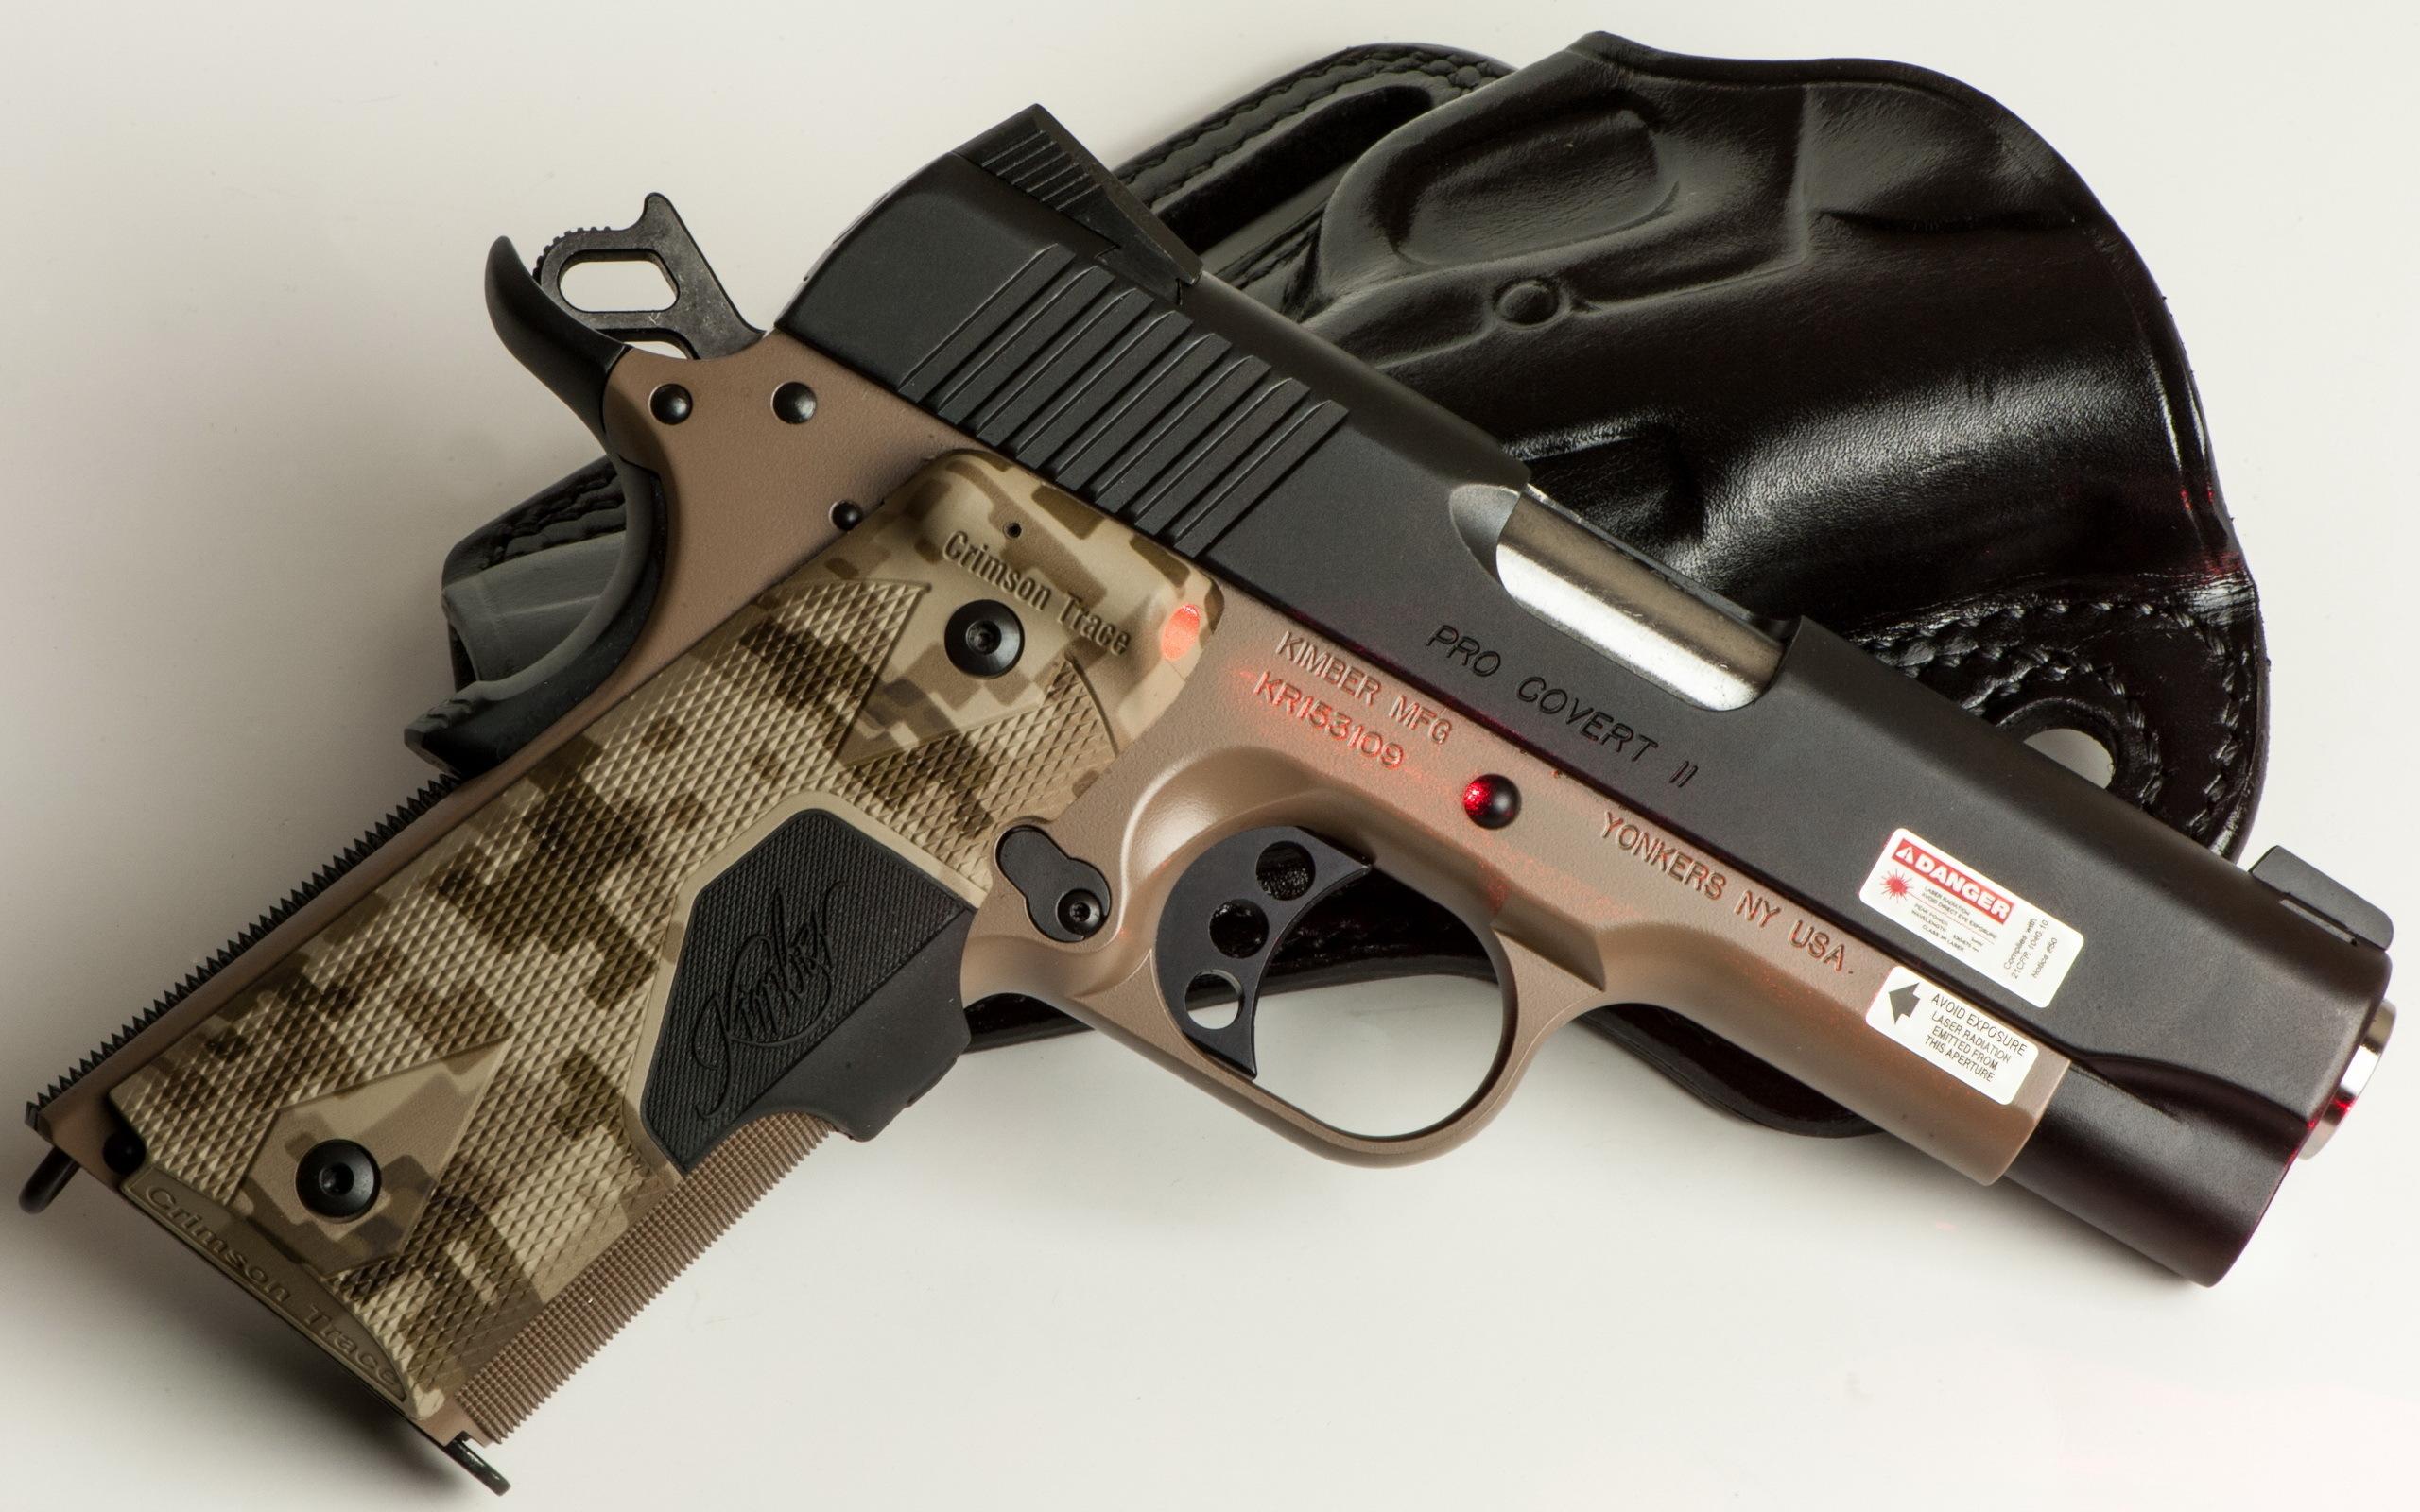 2560x1600 > Kimber Pistol Wallpapers